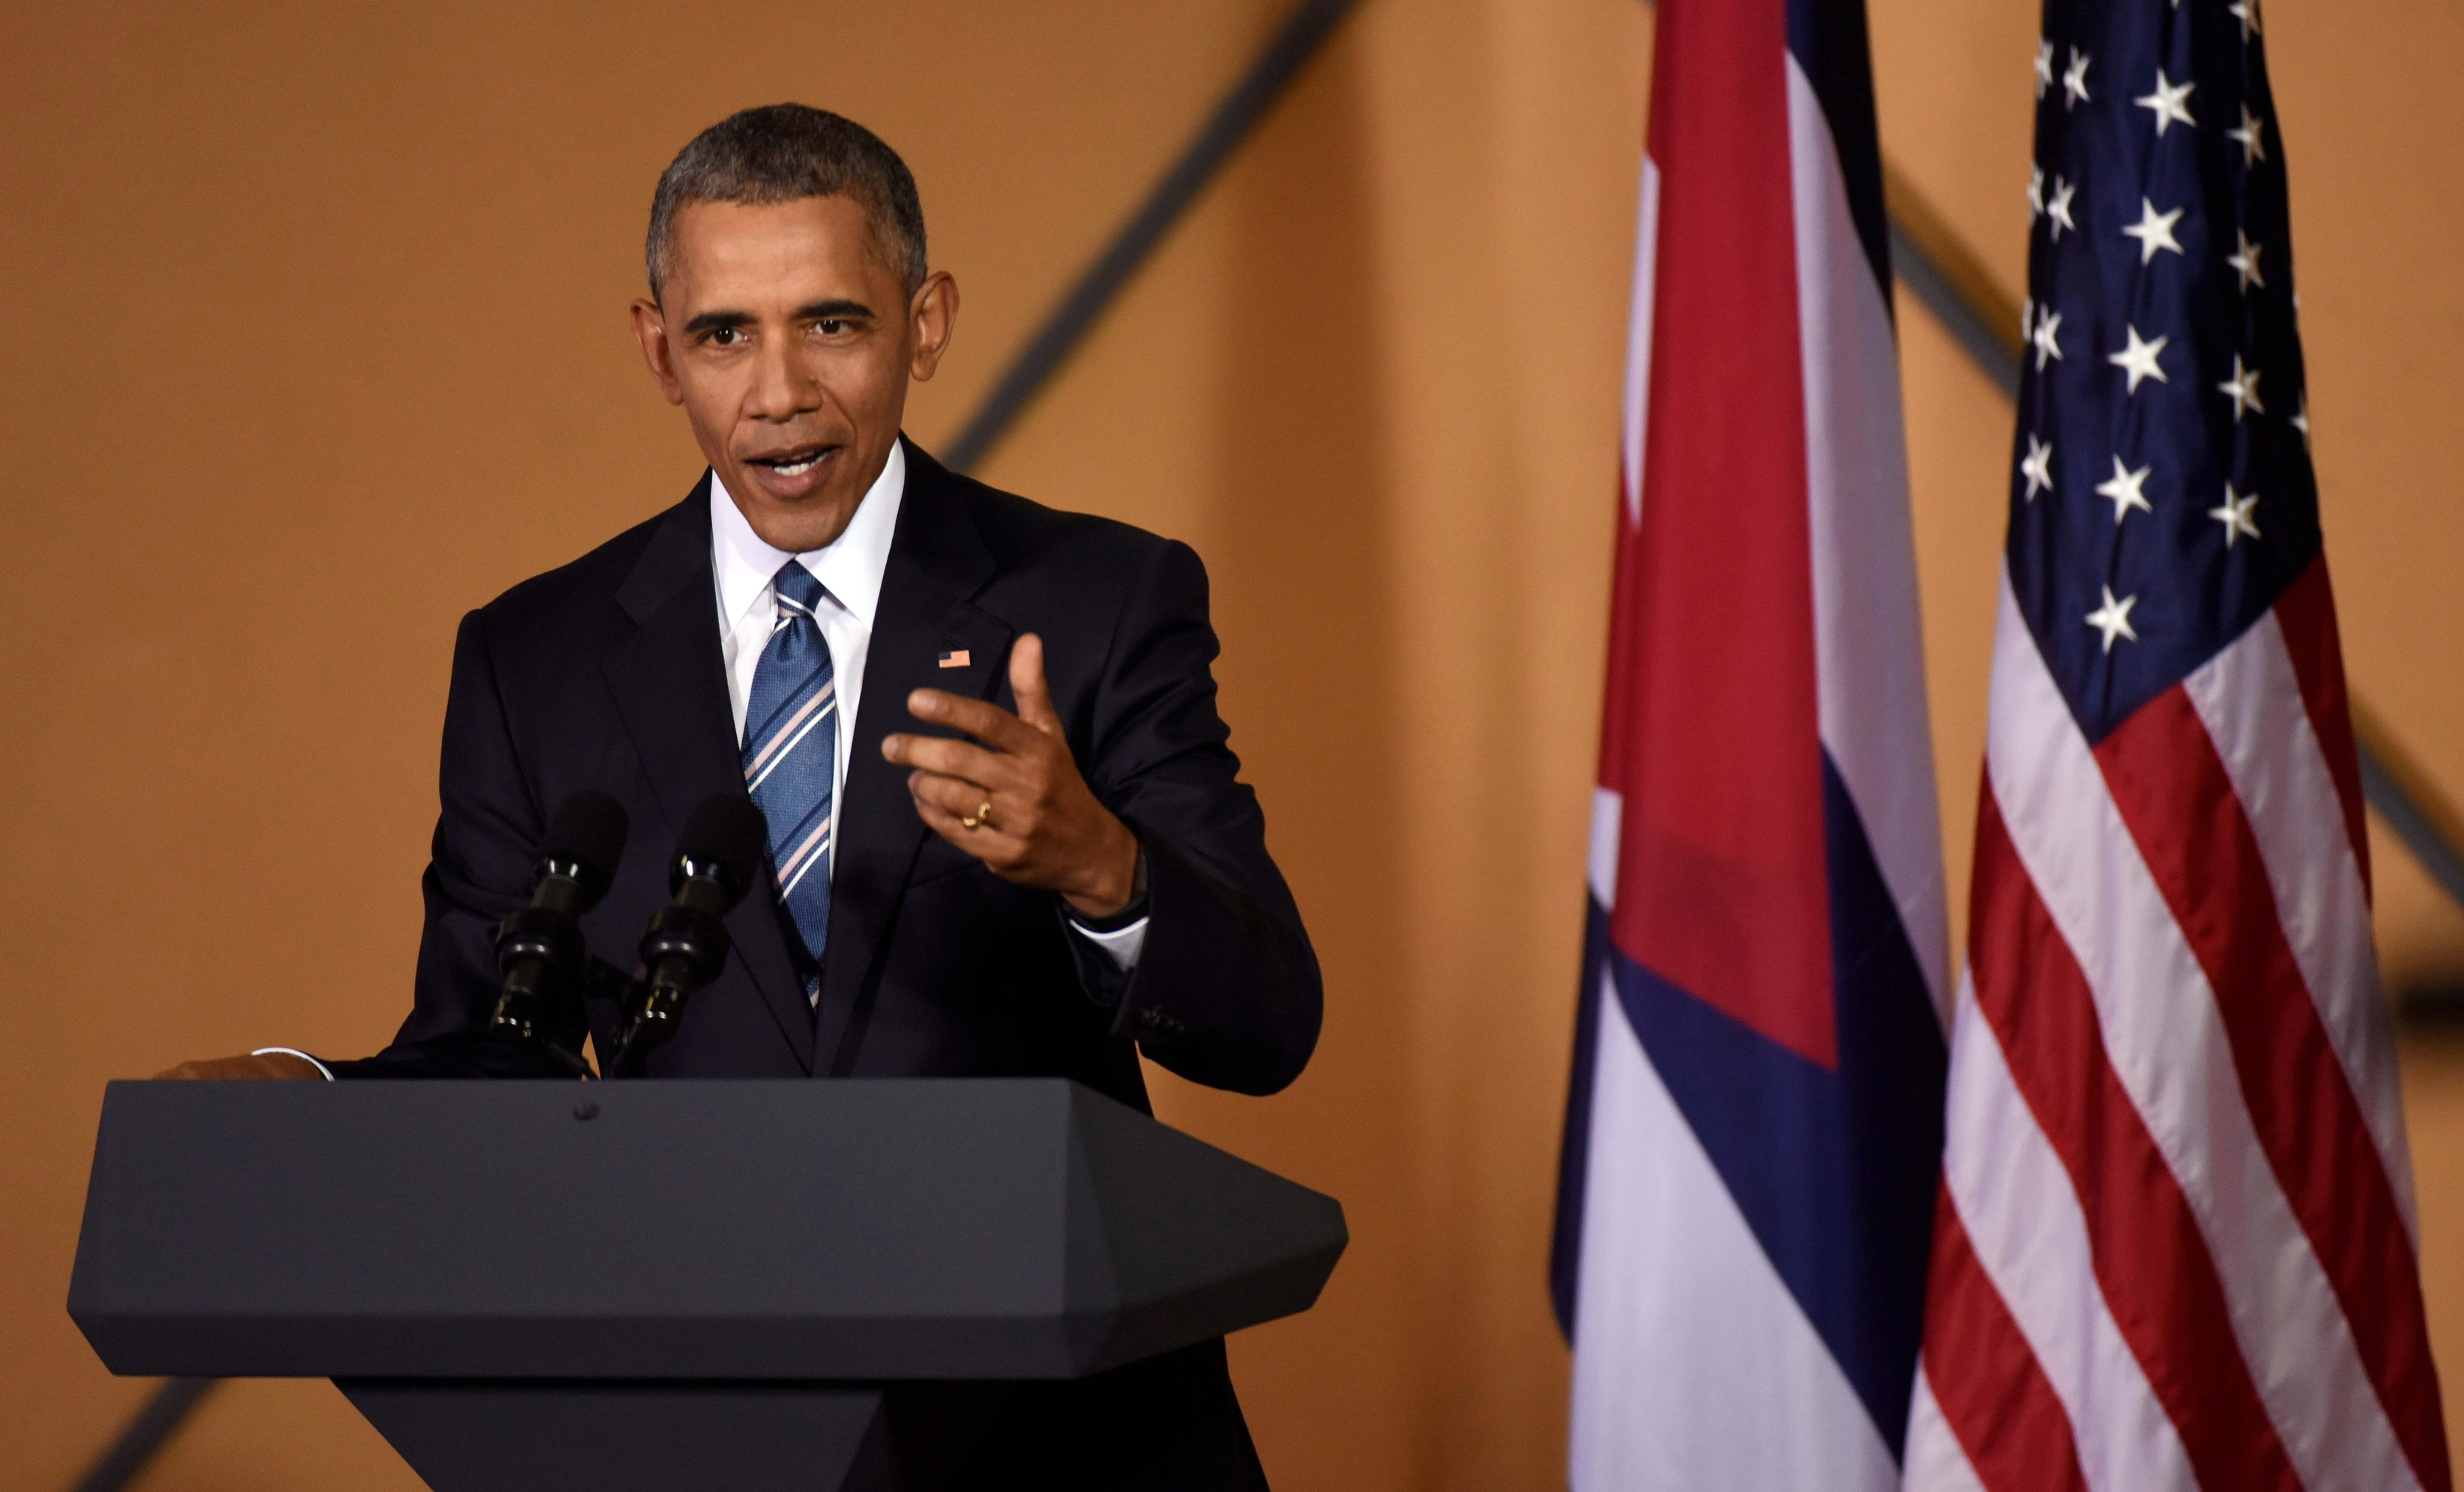 Barack Obama Colin Kaepernick